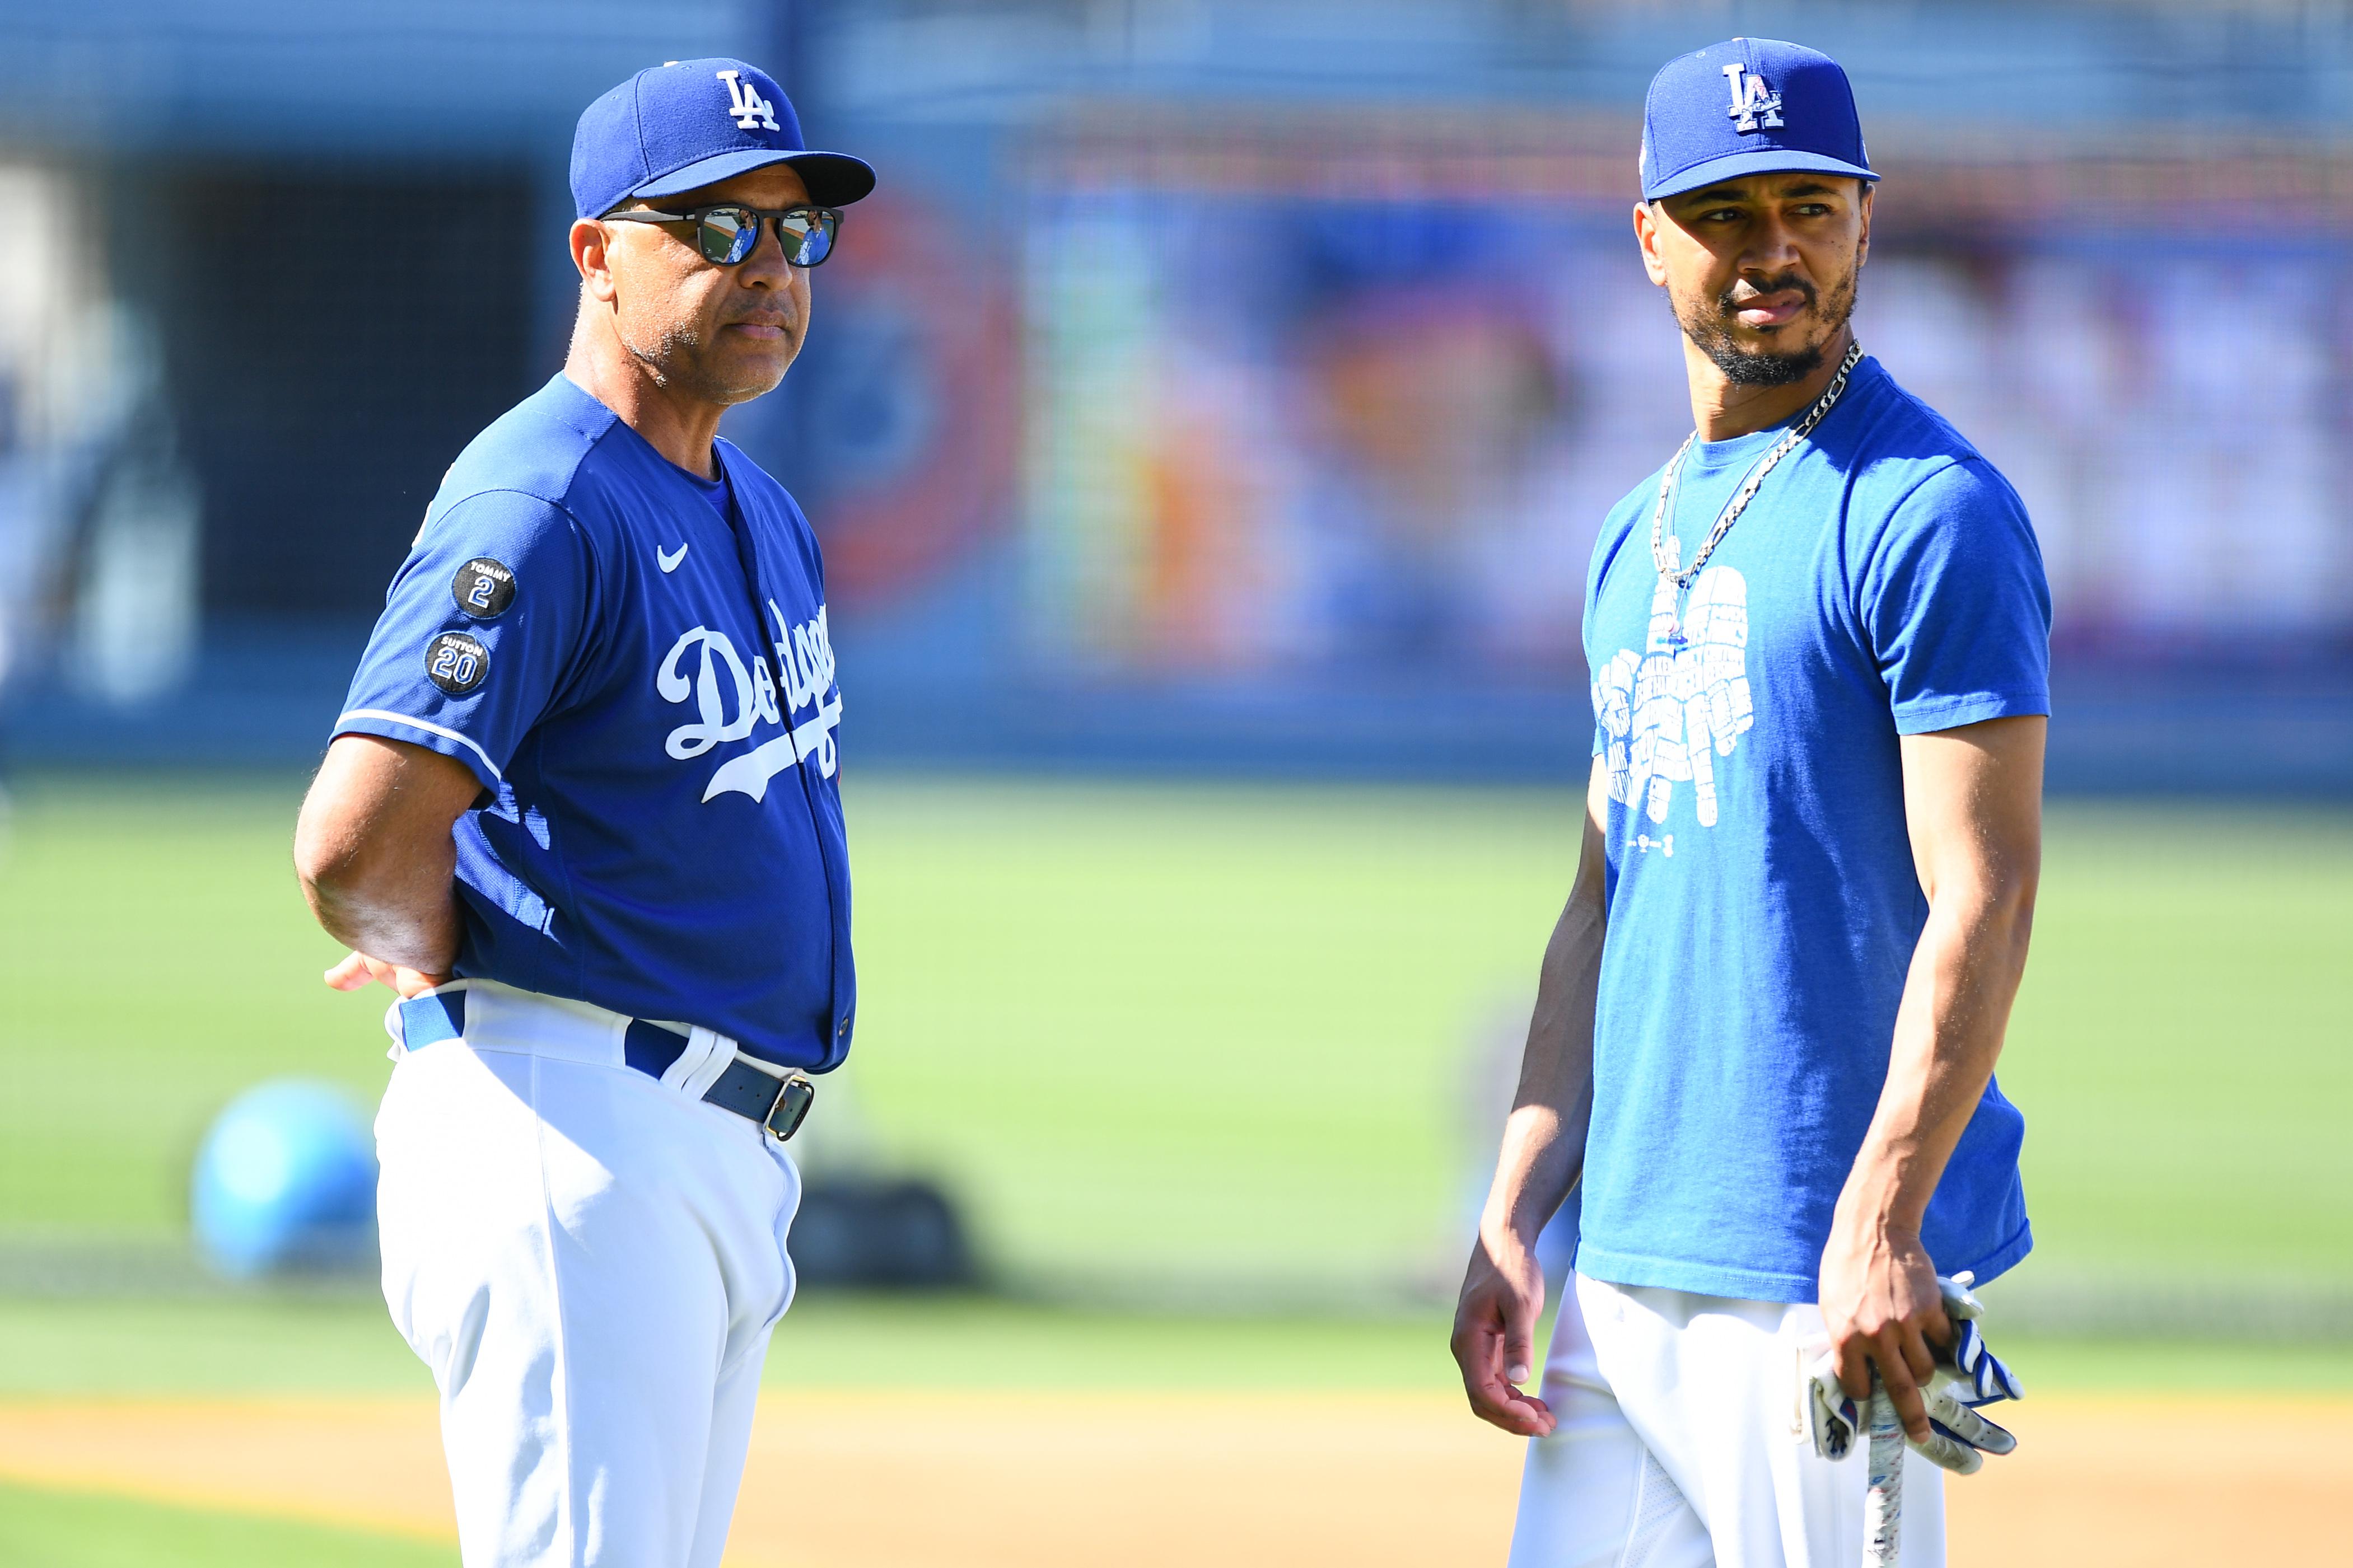 MLB: JUL 19 Giants at Dodgers